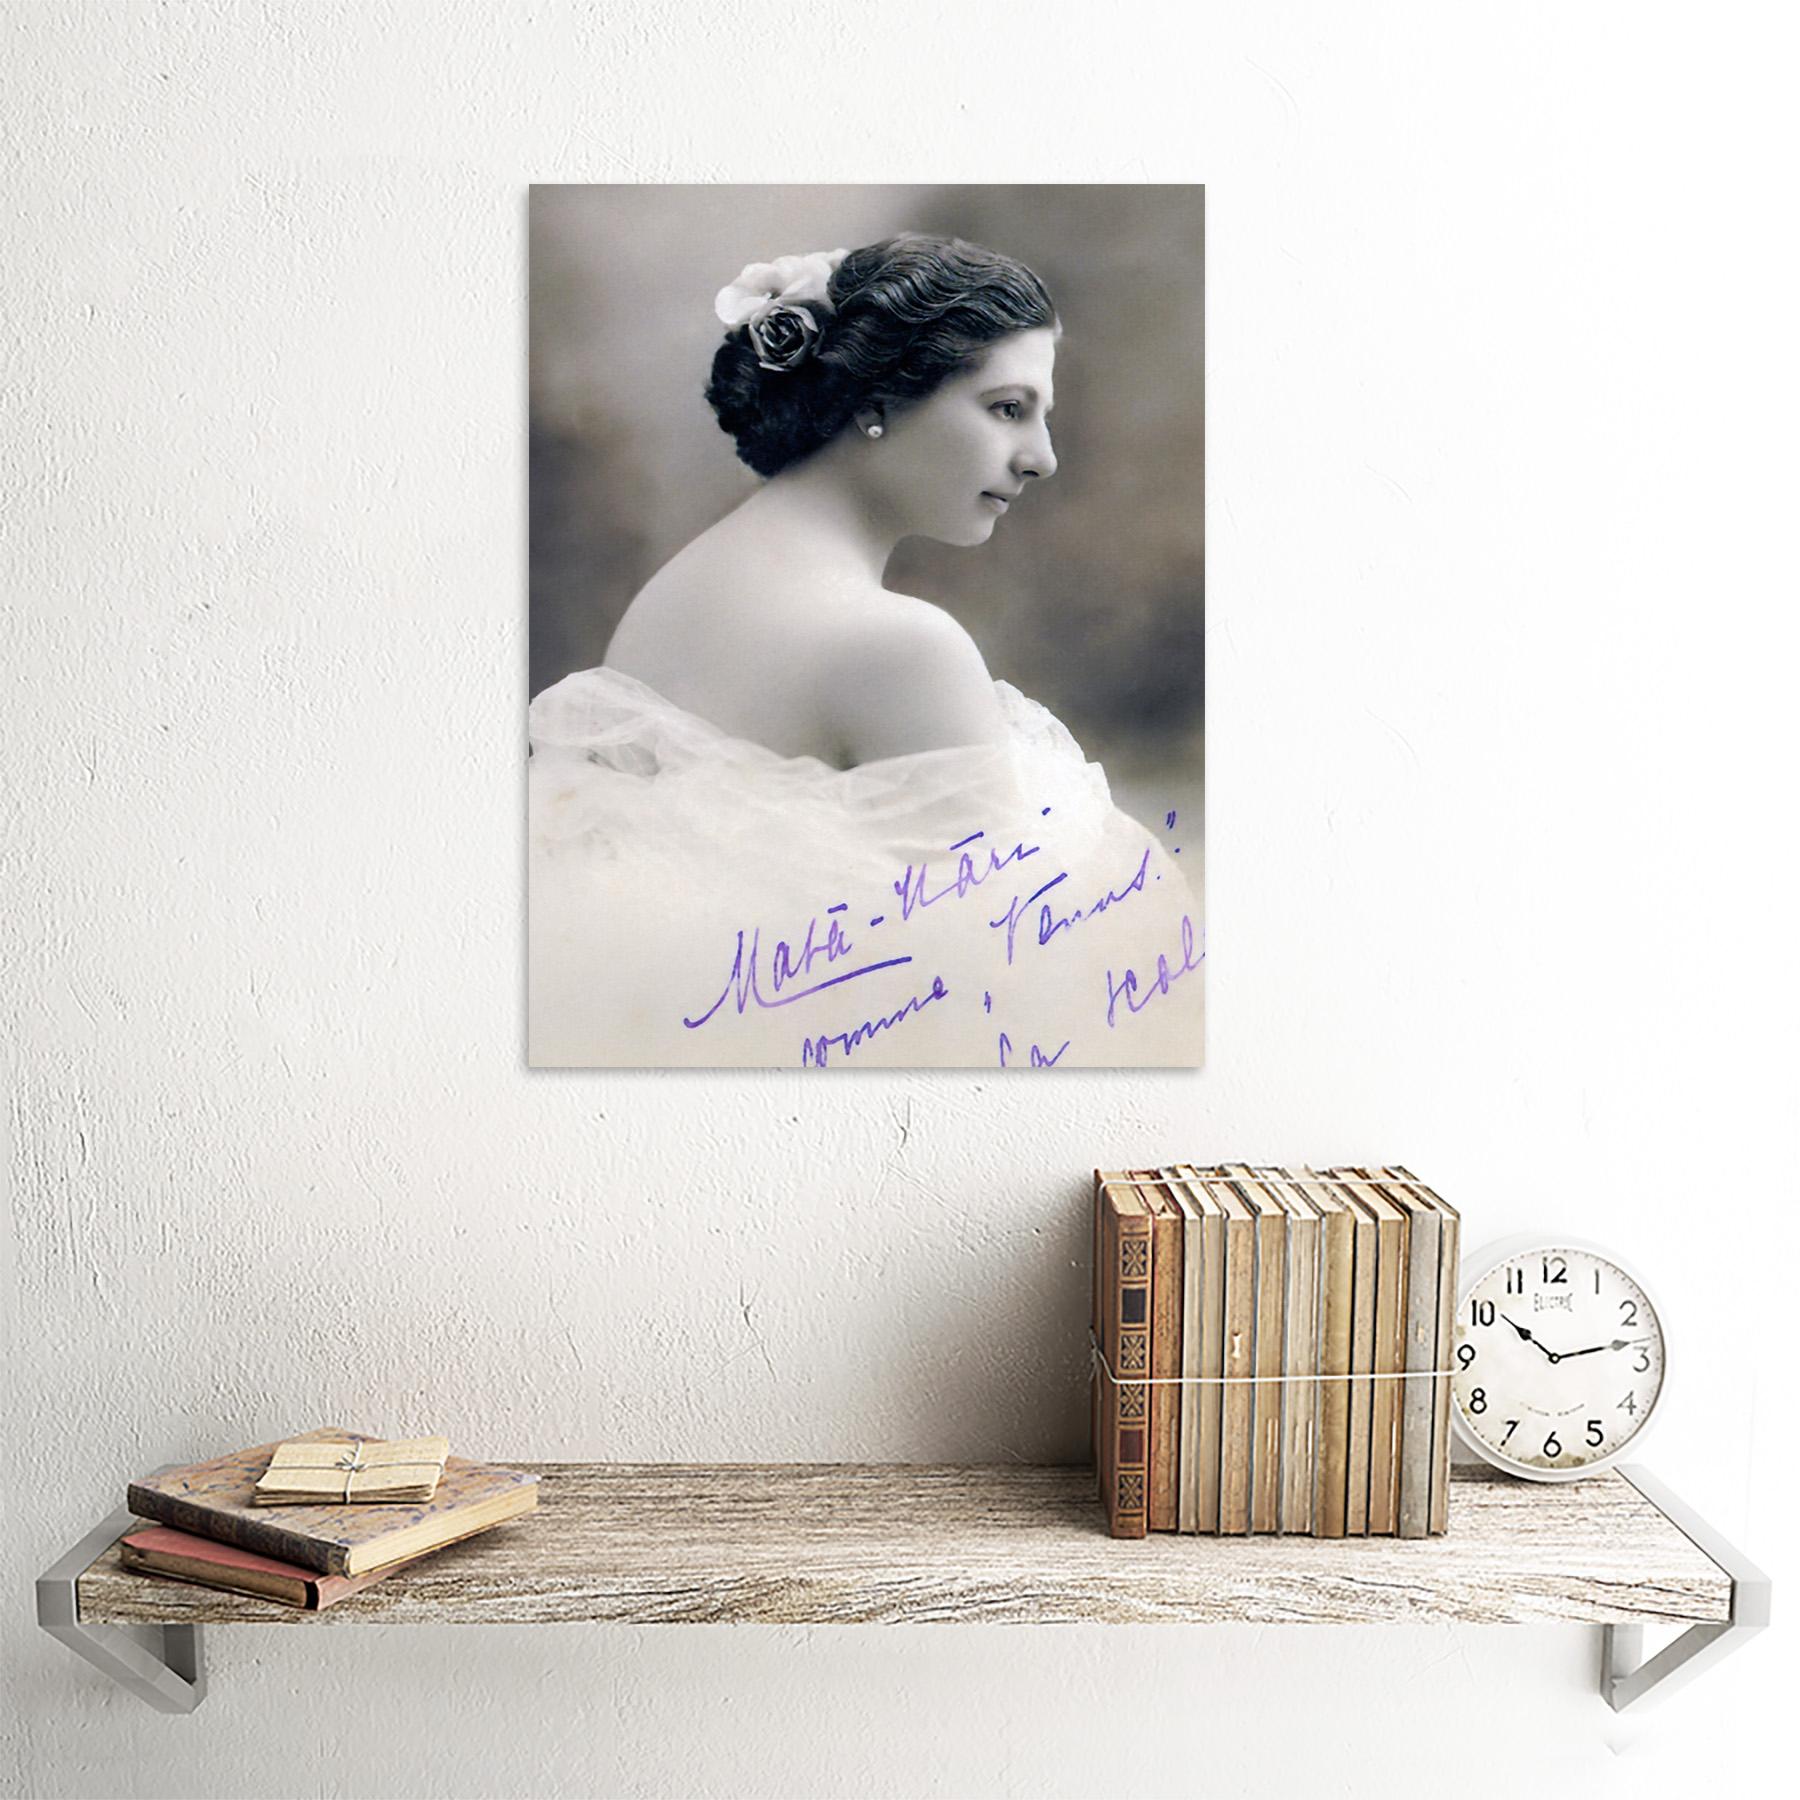 Autographed-Portrait-Dancer-Spy-Mata-Hari-Photo-Framed-Wall-Art-Poster thumbnail 23